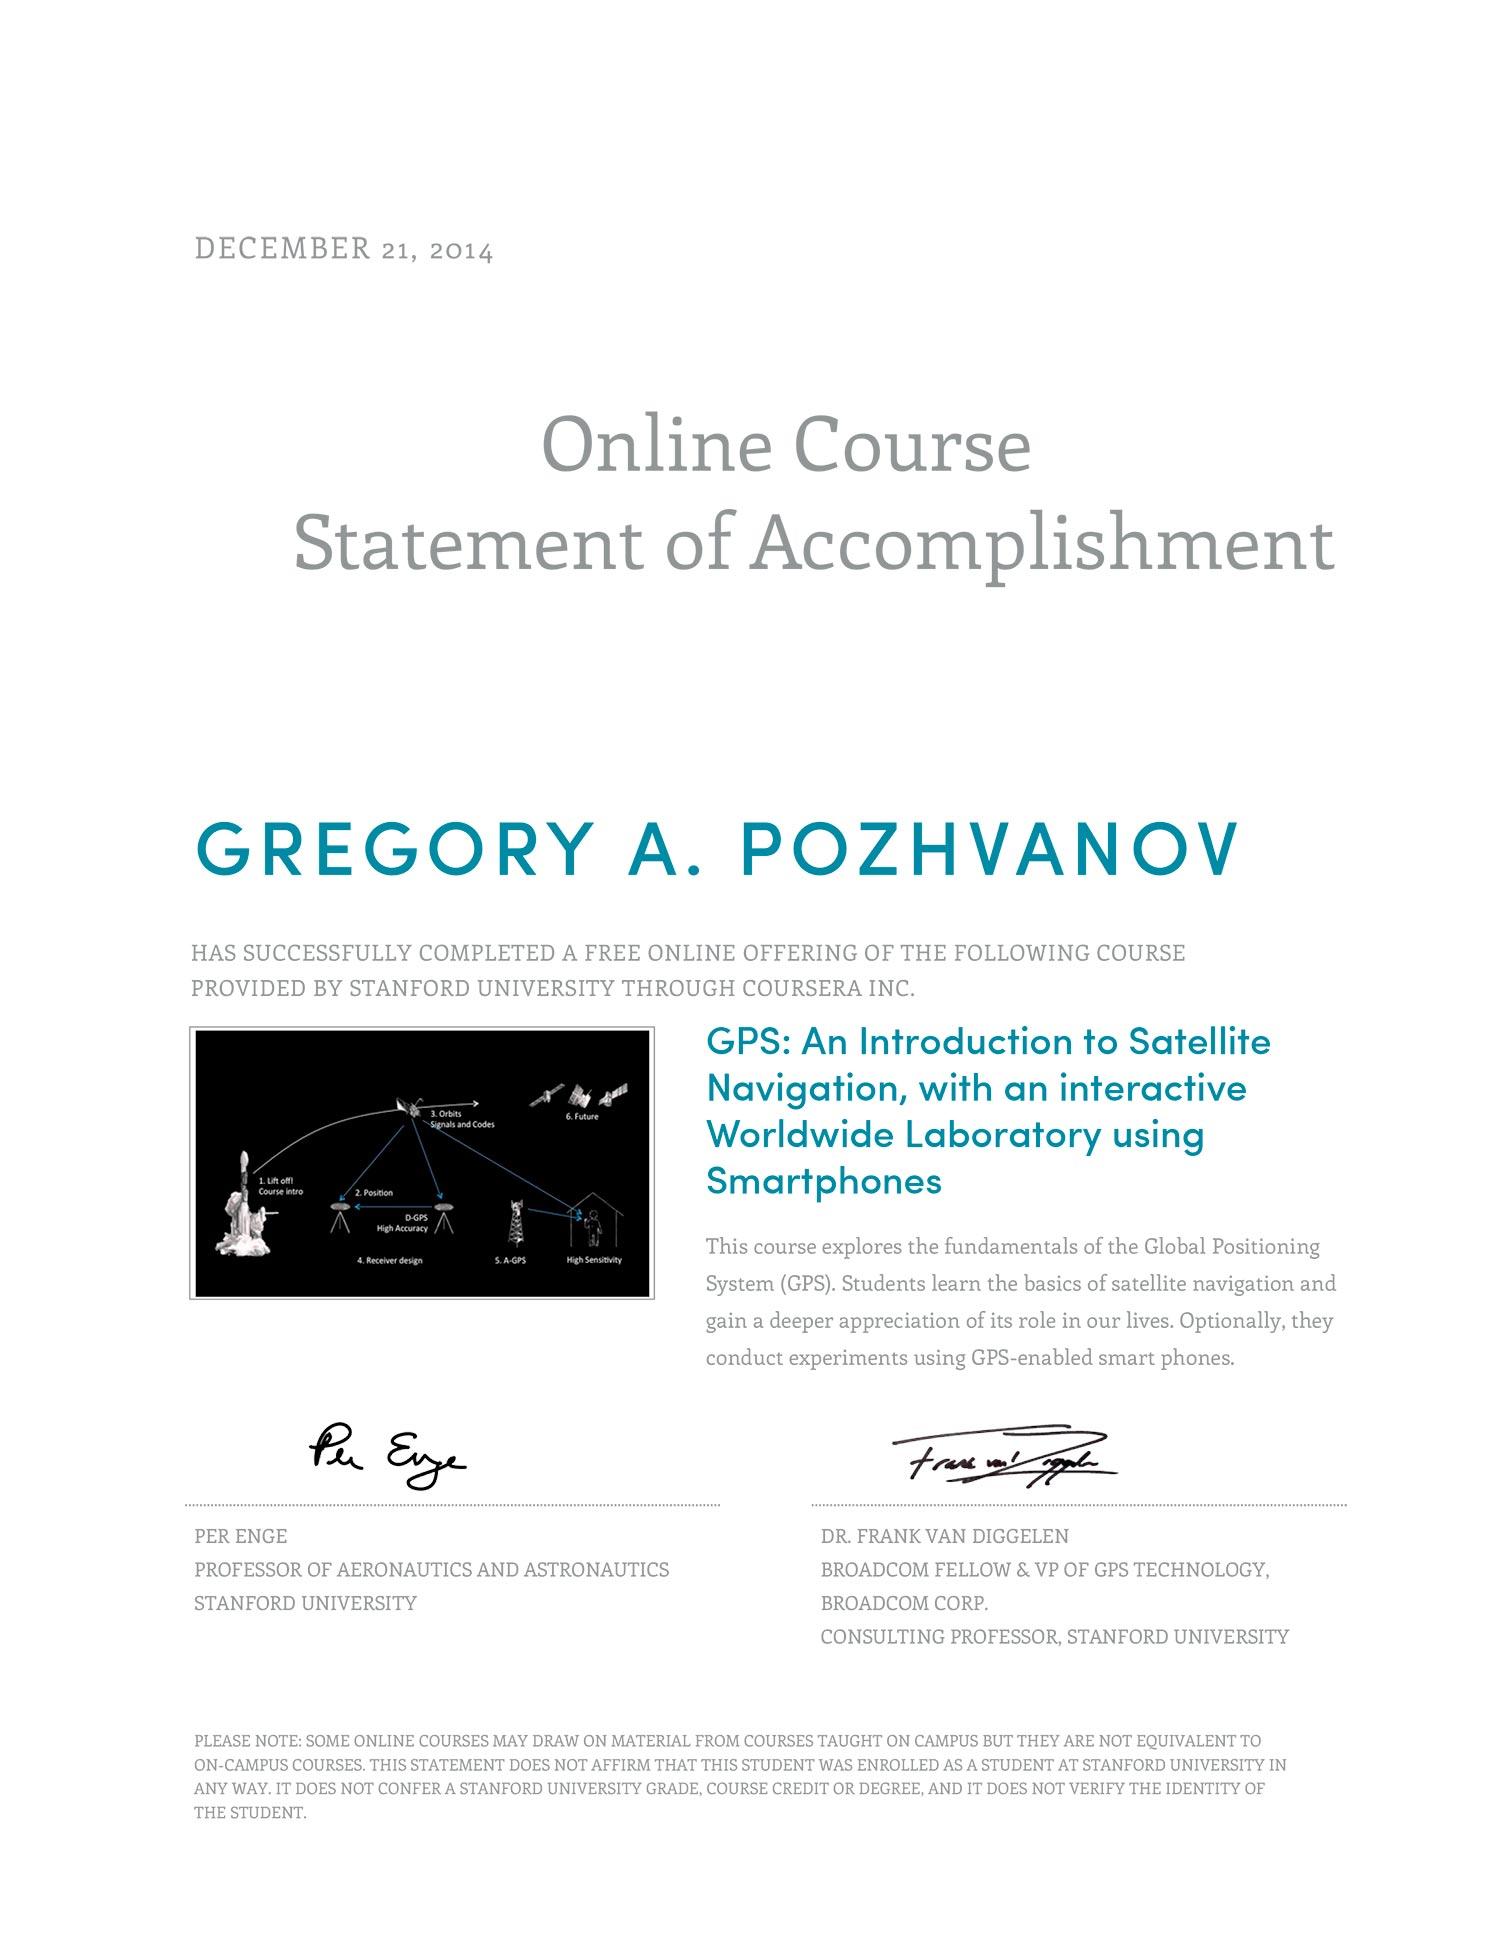 Coursera statement of accomplishment to Gregory A. Pozhvanov